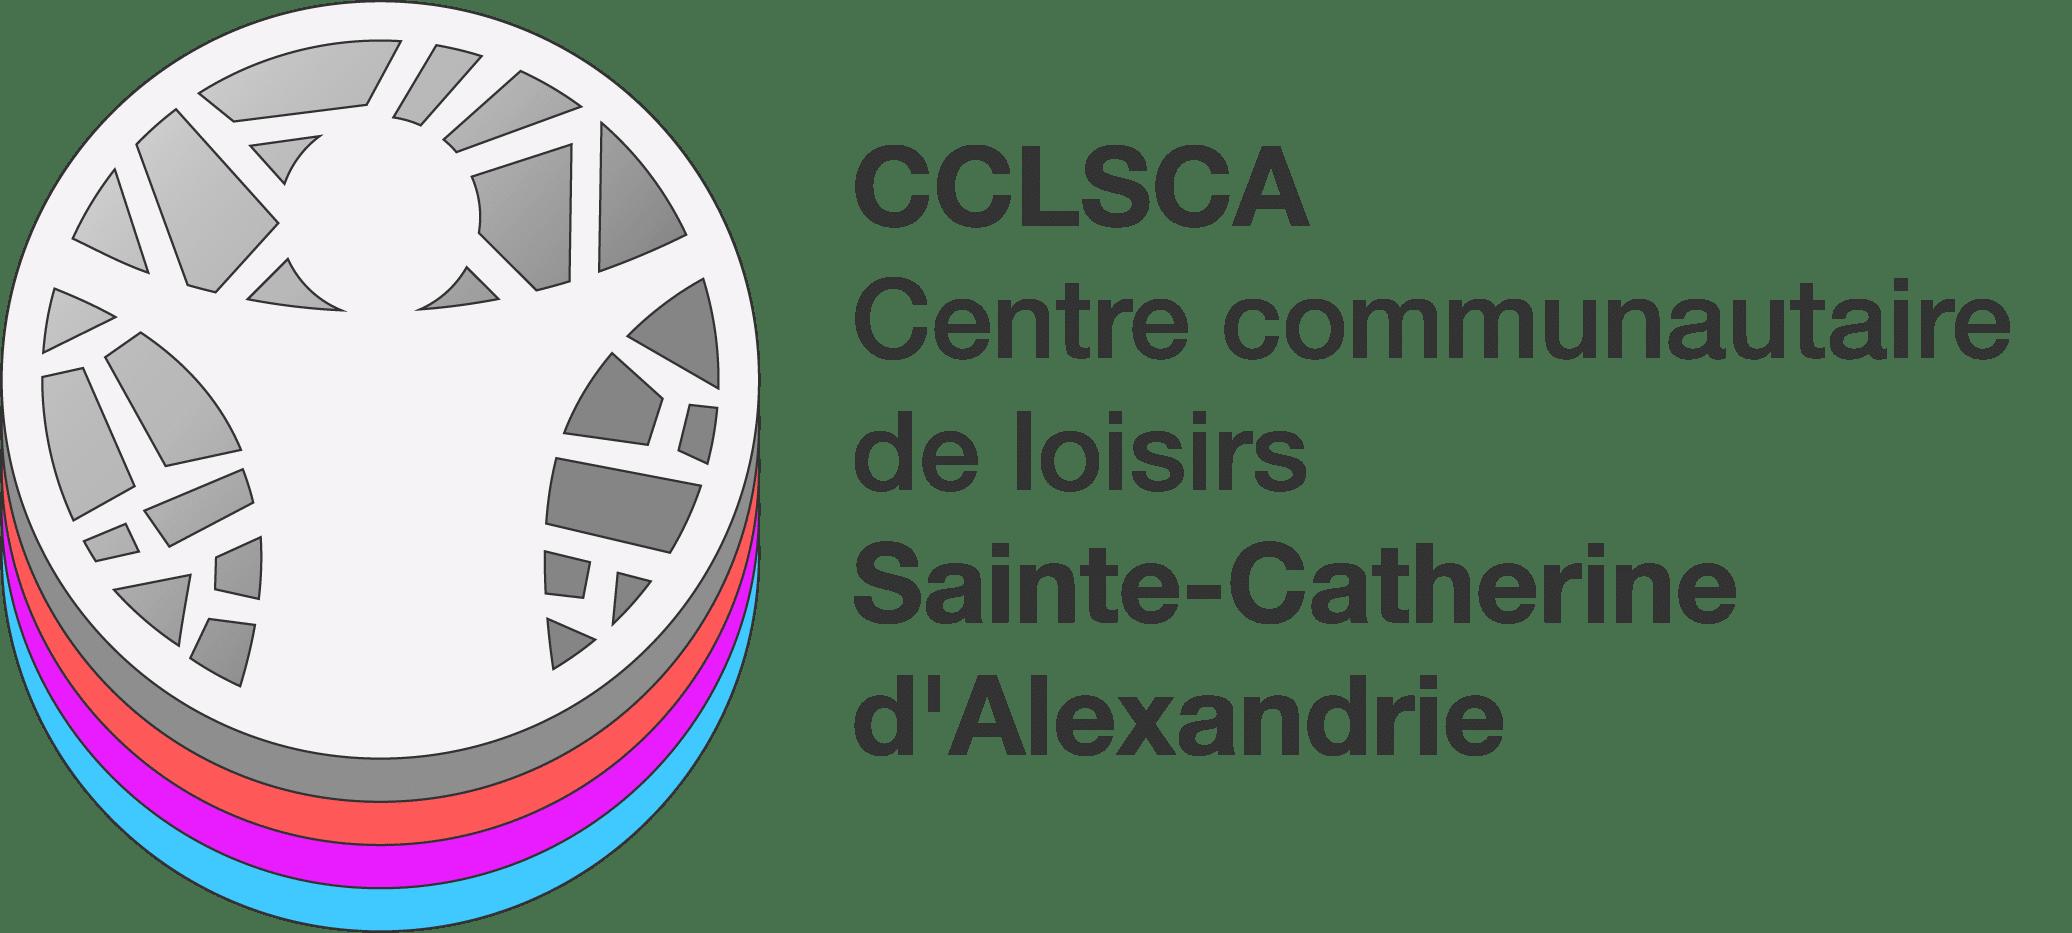 Logo CCLSCA